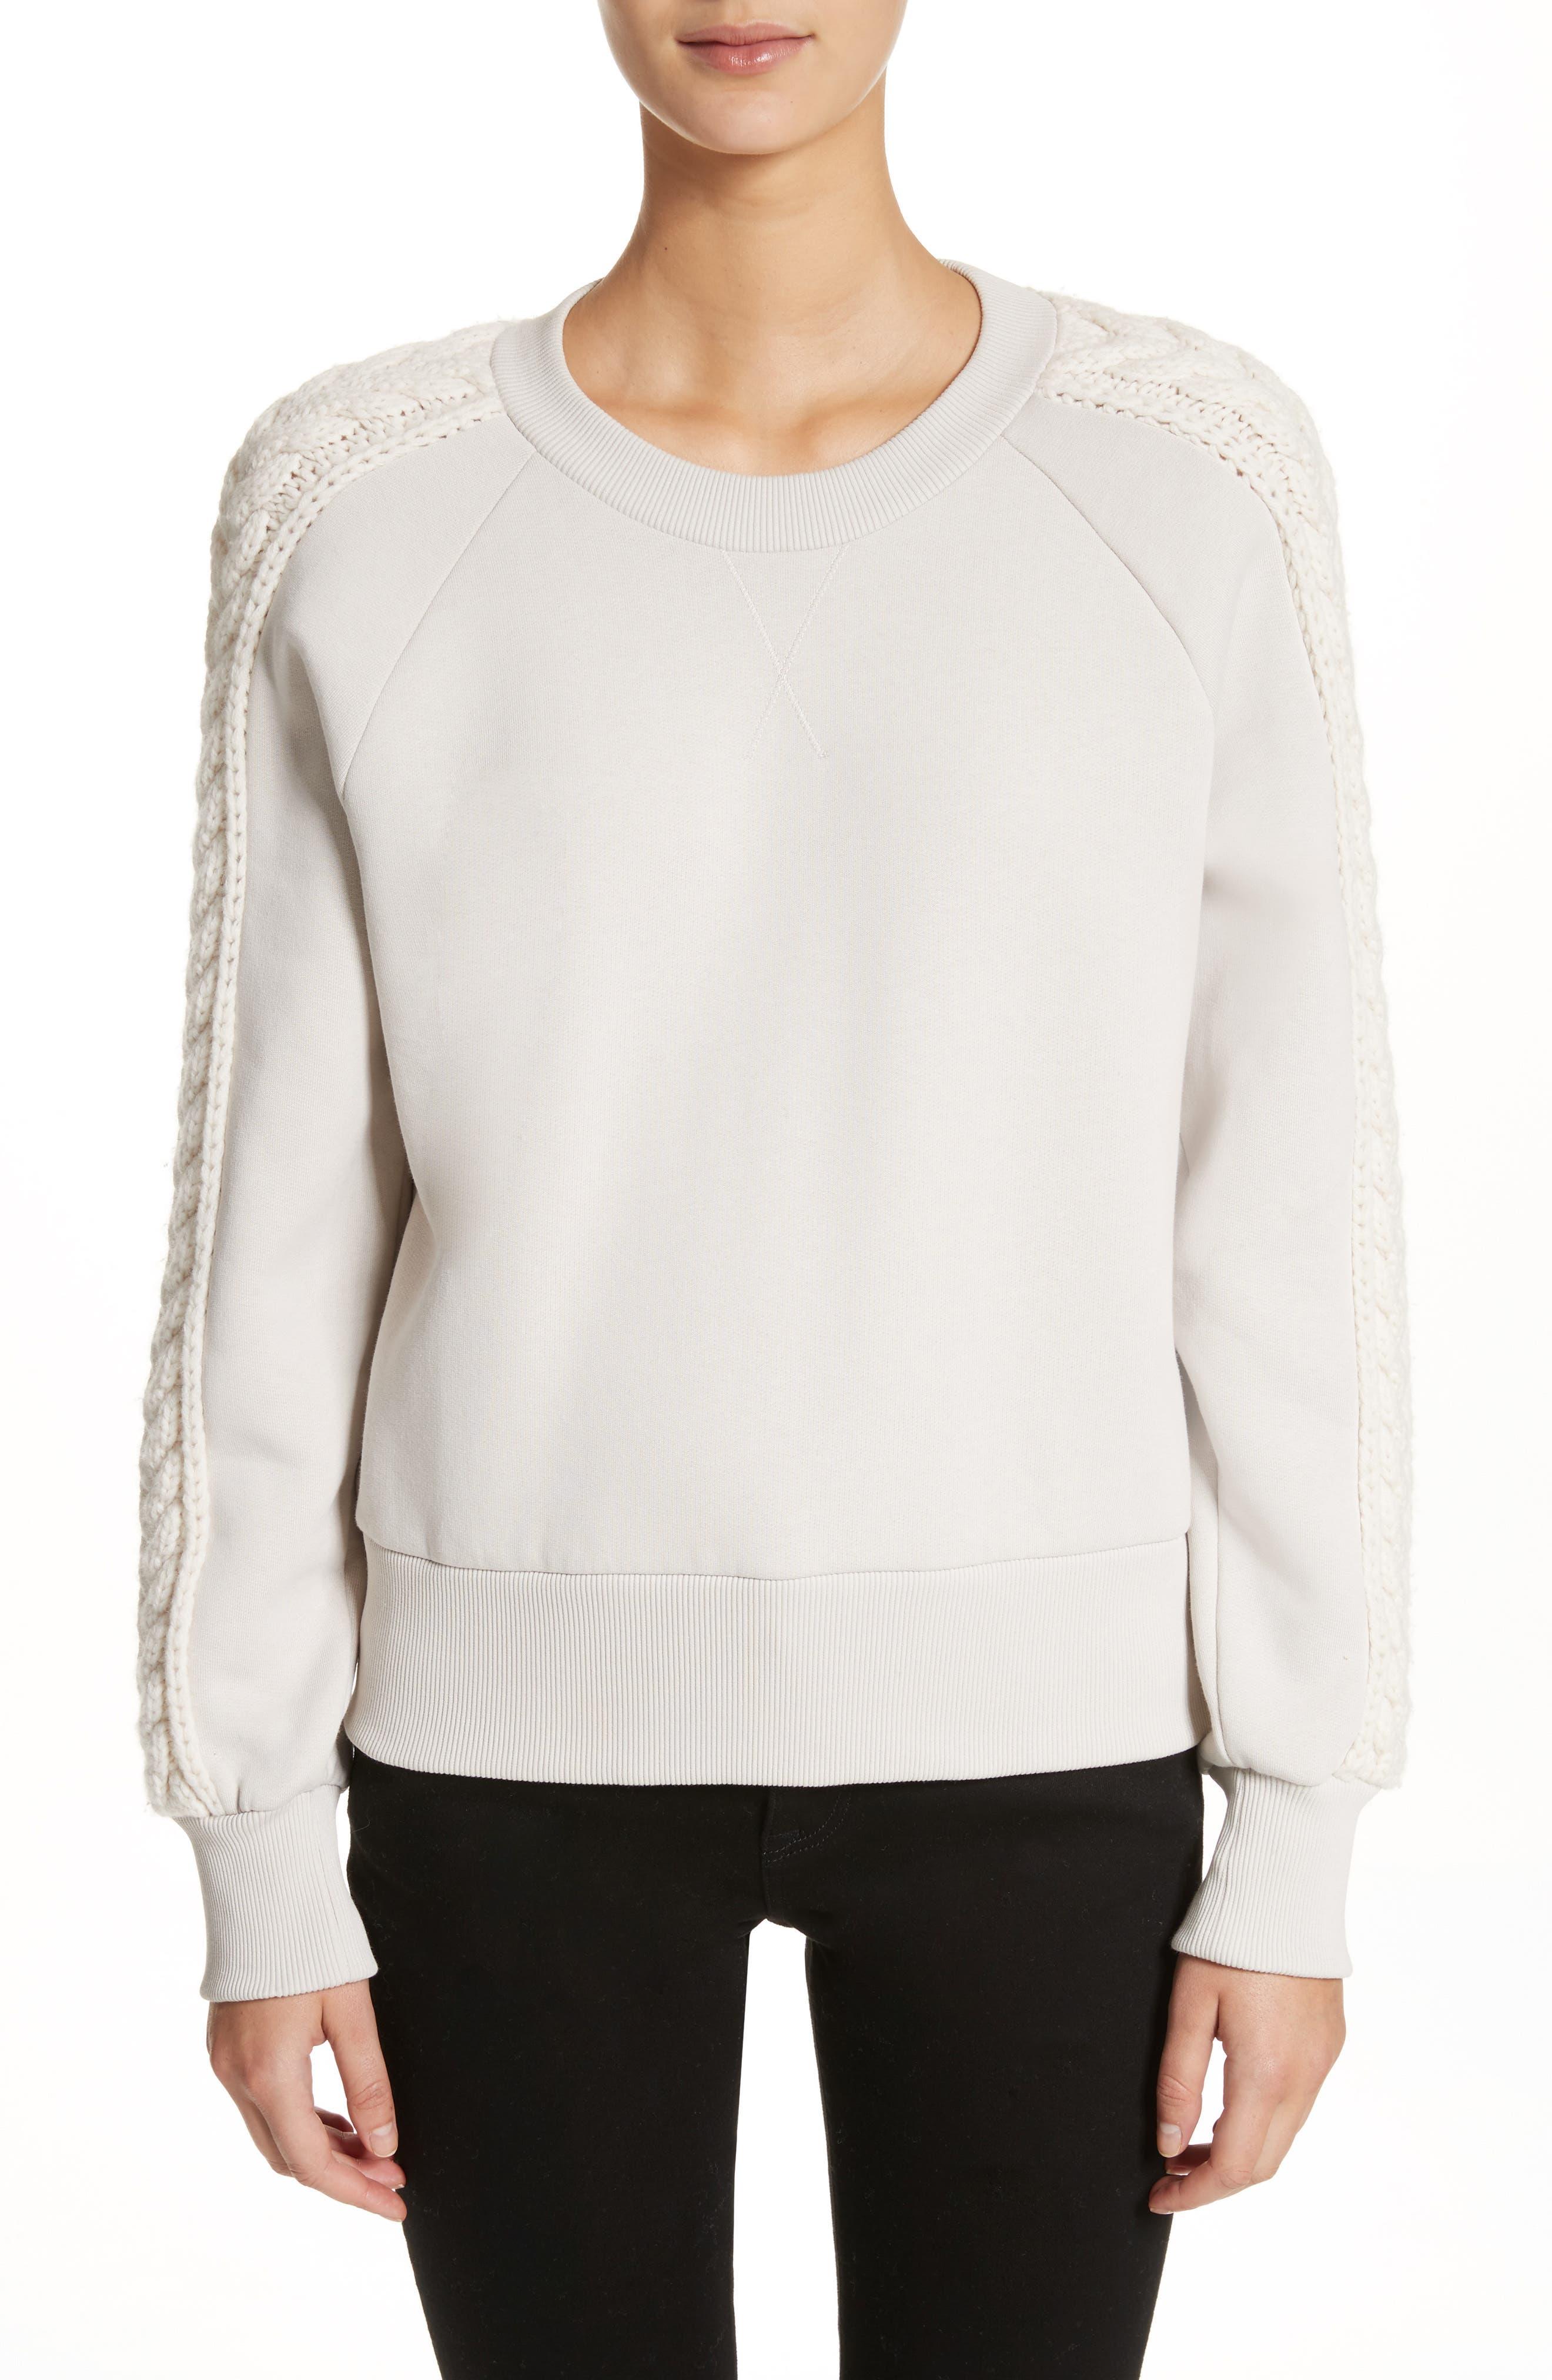 Selho Sweatshirt,                         Main,                         color, Winter White